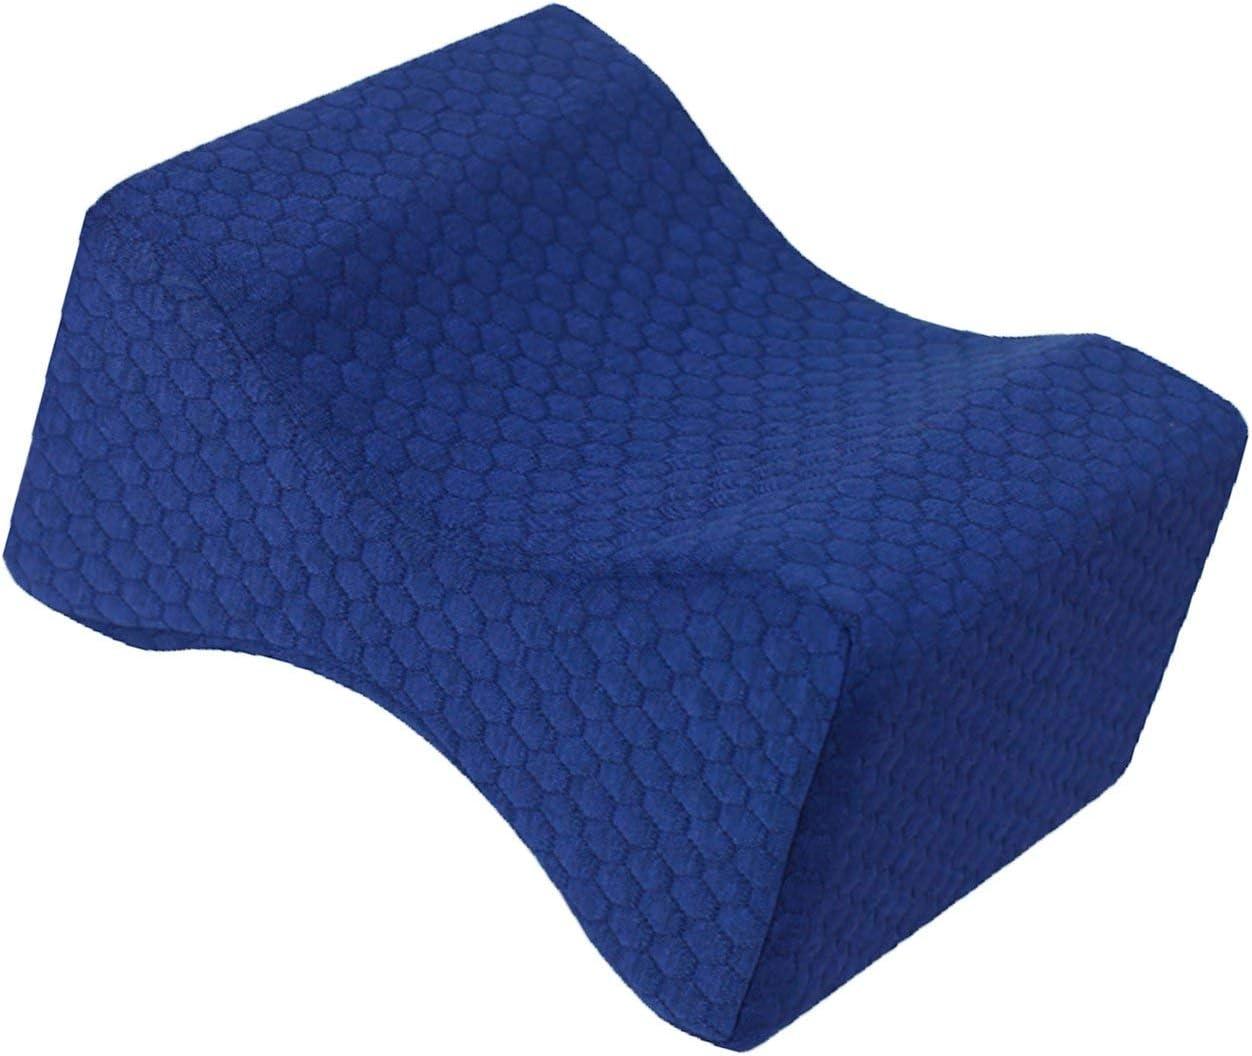 Liobaba Comfortable Memory Foam Mat Pillows Sleeping Bolster Under Knee Pillow Orthopedic Posture Supporter Leg Cushion